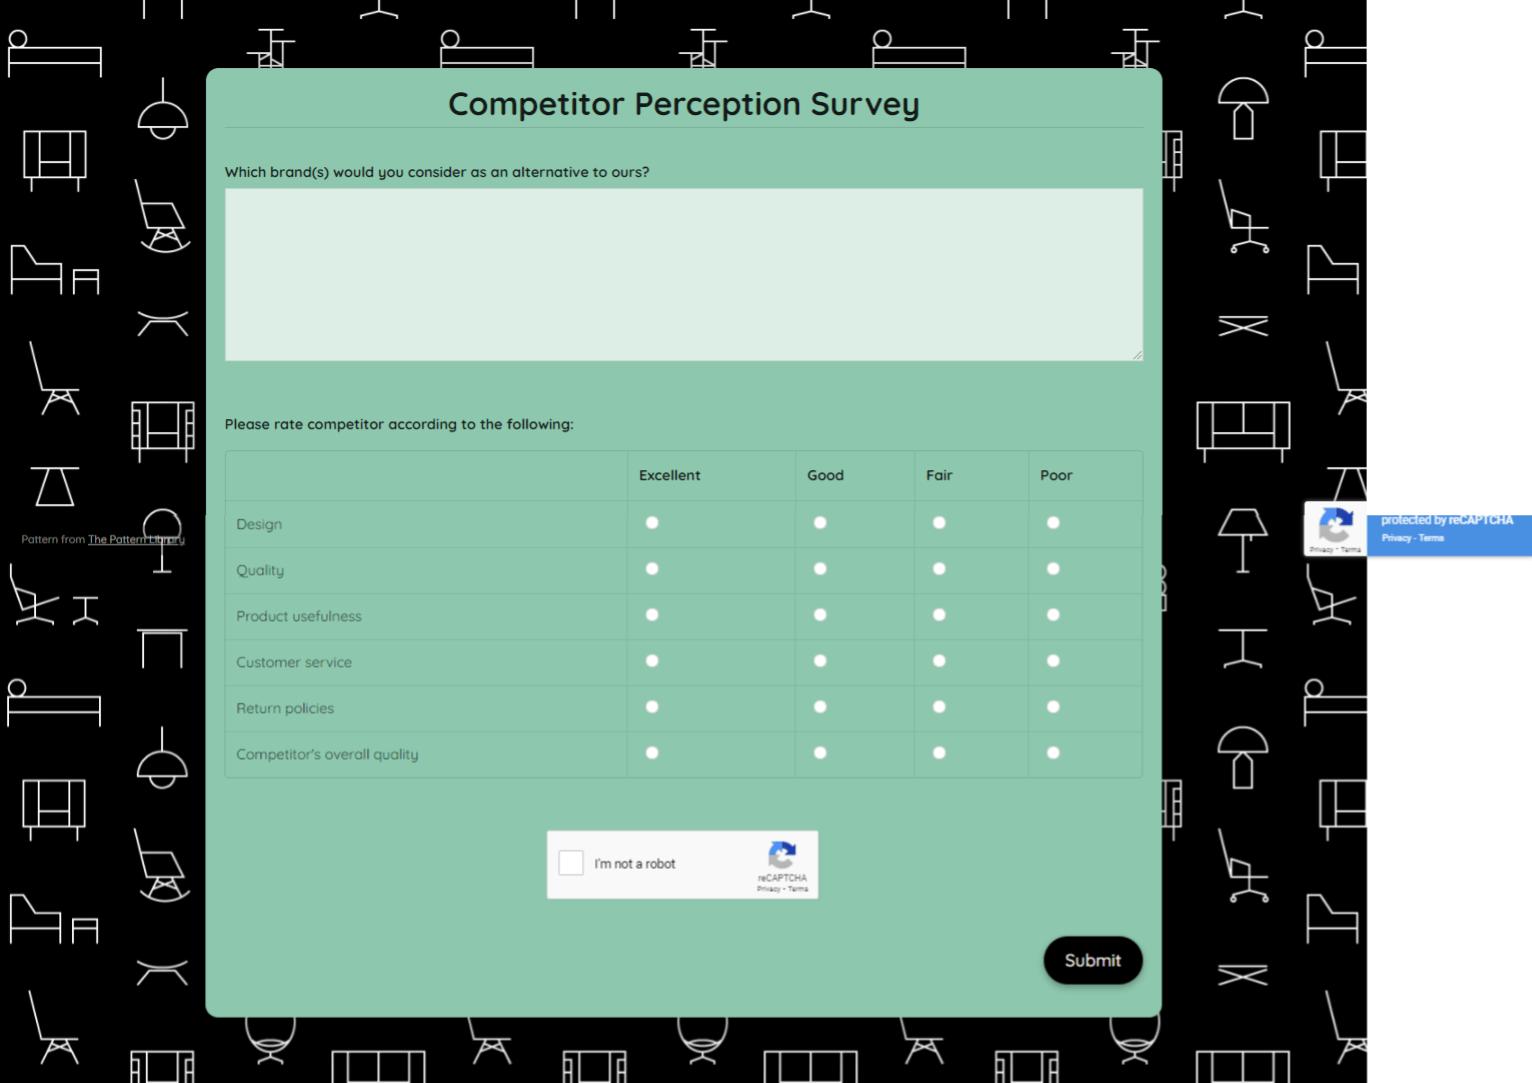 Competitor Perception Survey Template template